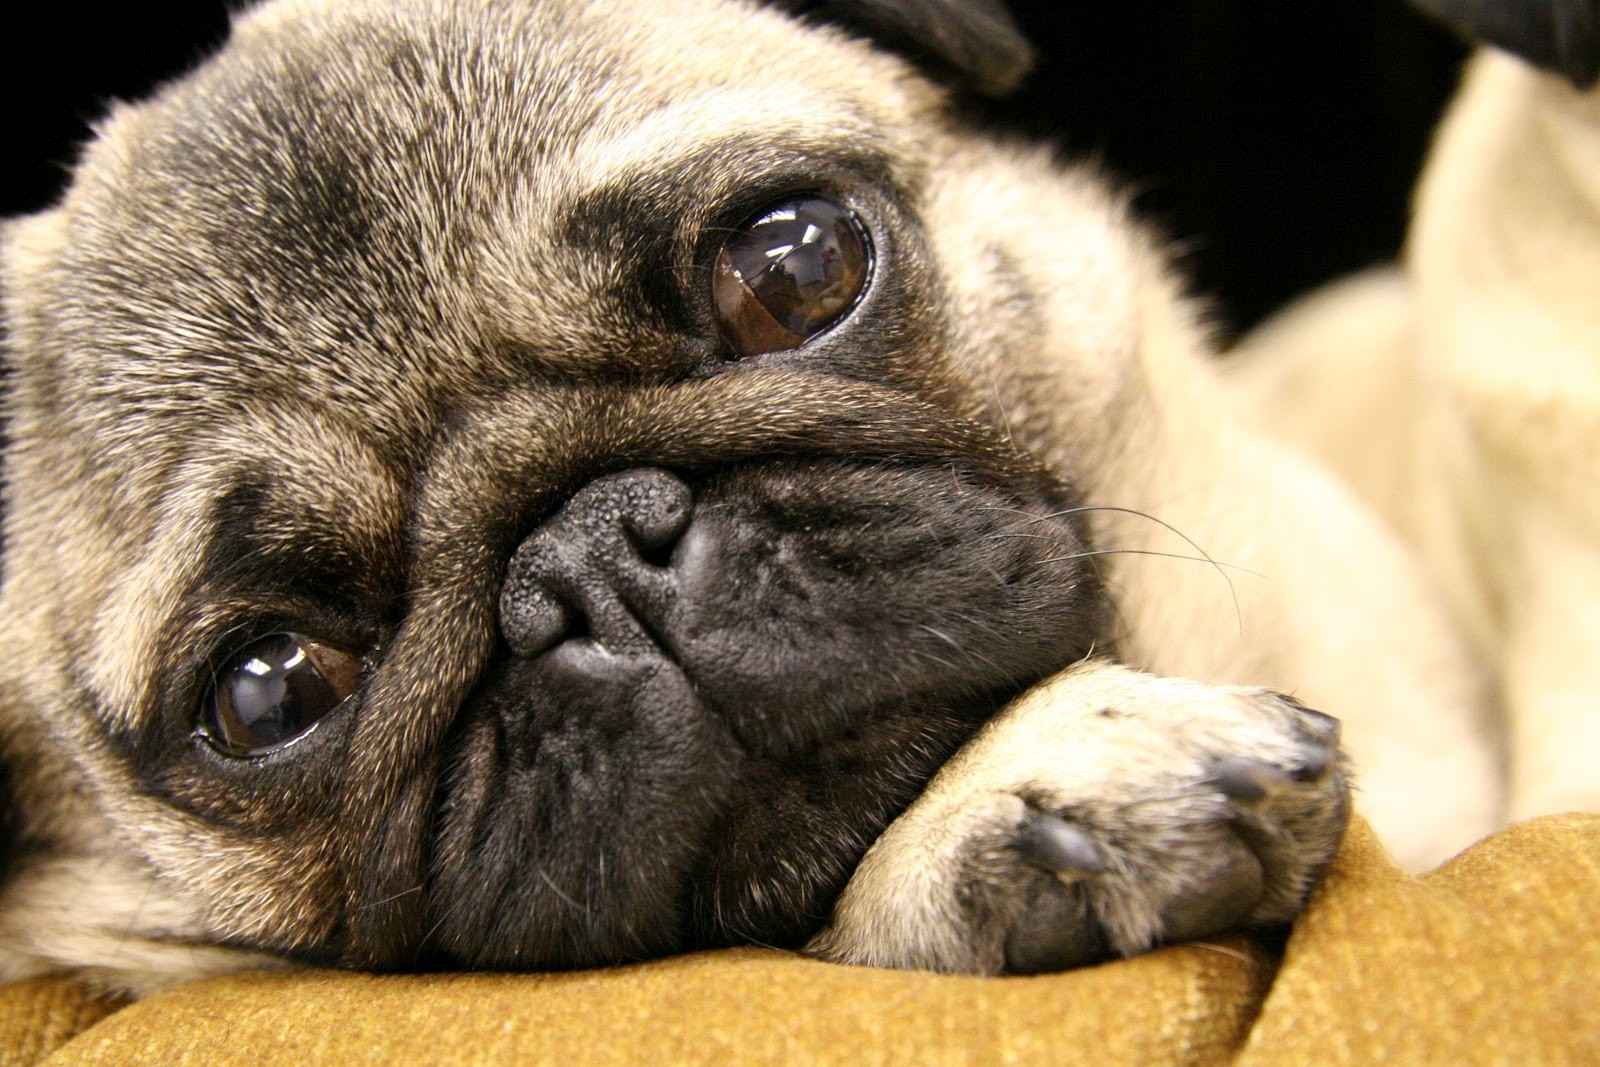 Carlin, un chien dégoûtant - Le carlin